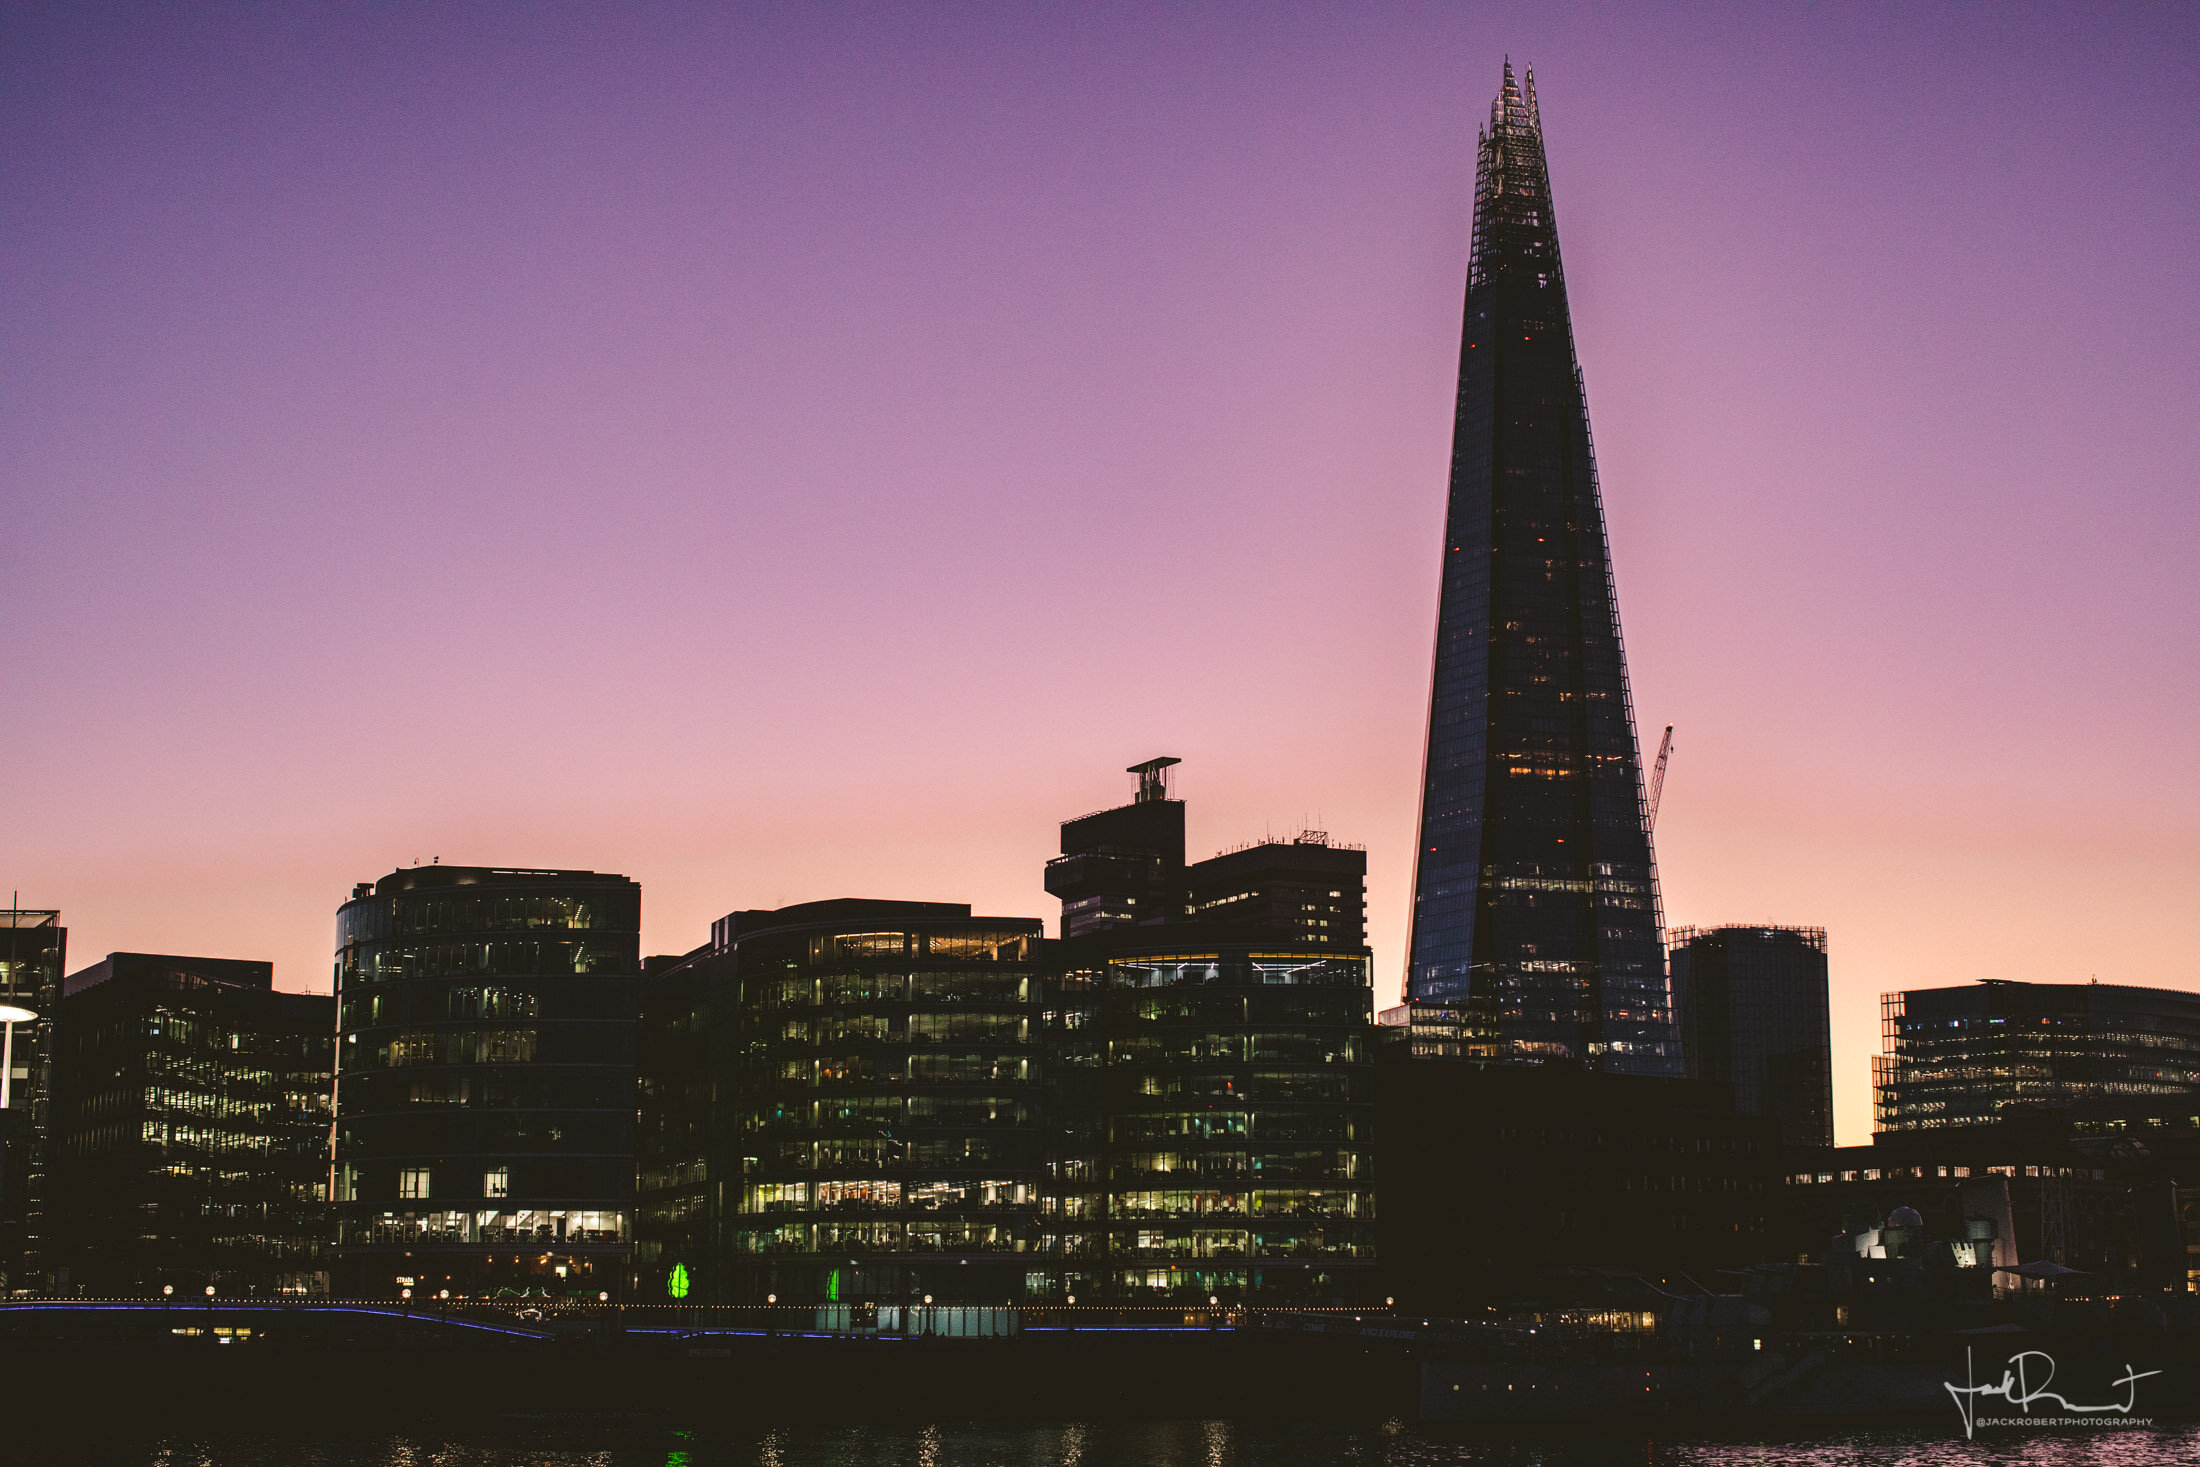 2020-01-18 London, UK - Jack Robert Photography (103 of 112).jpg